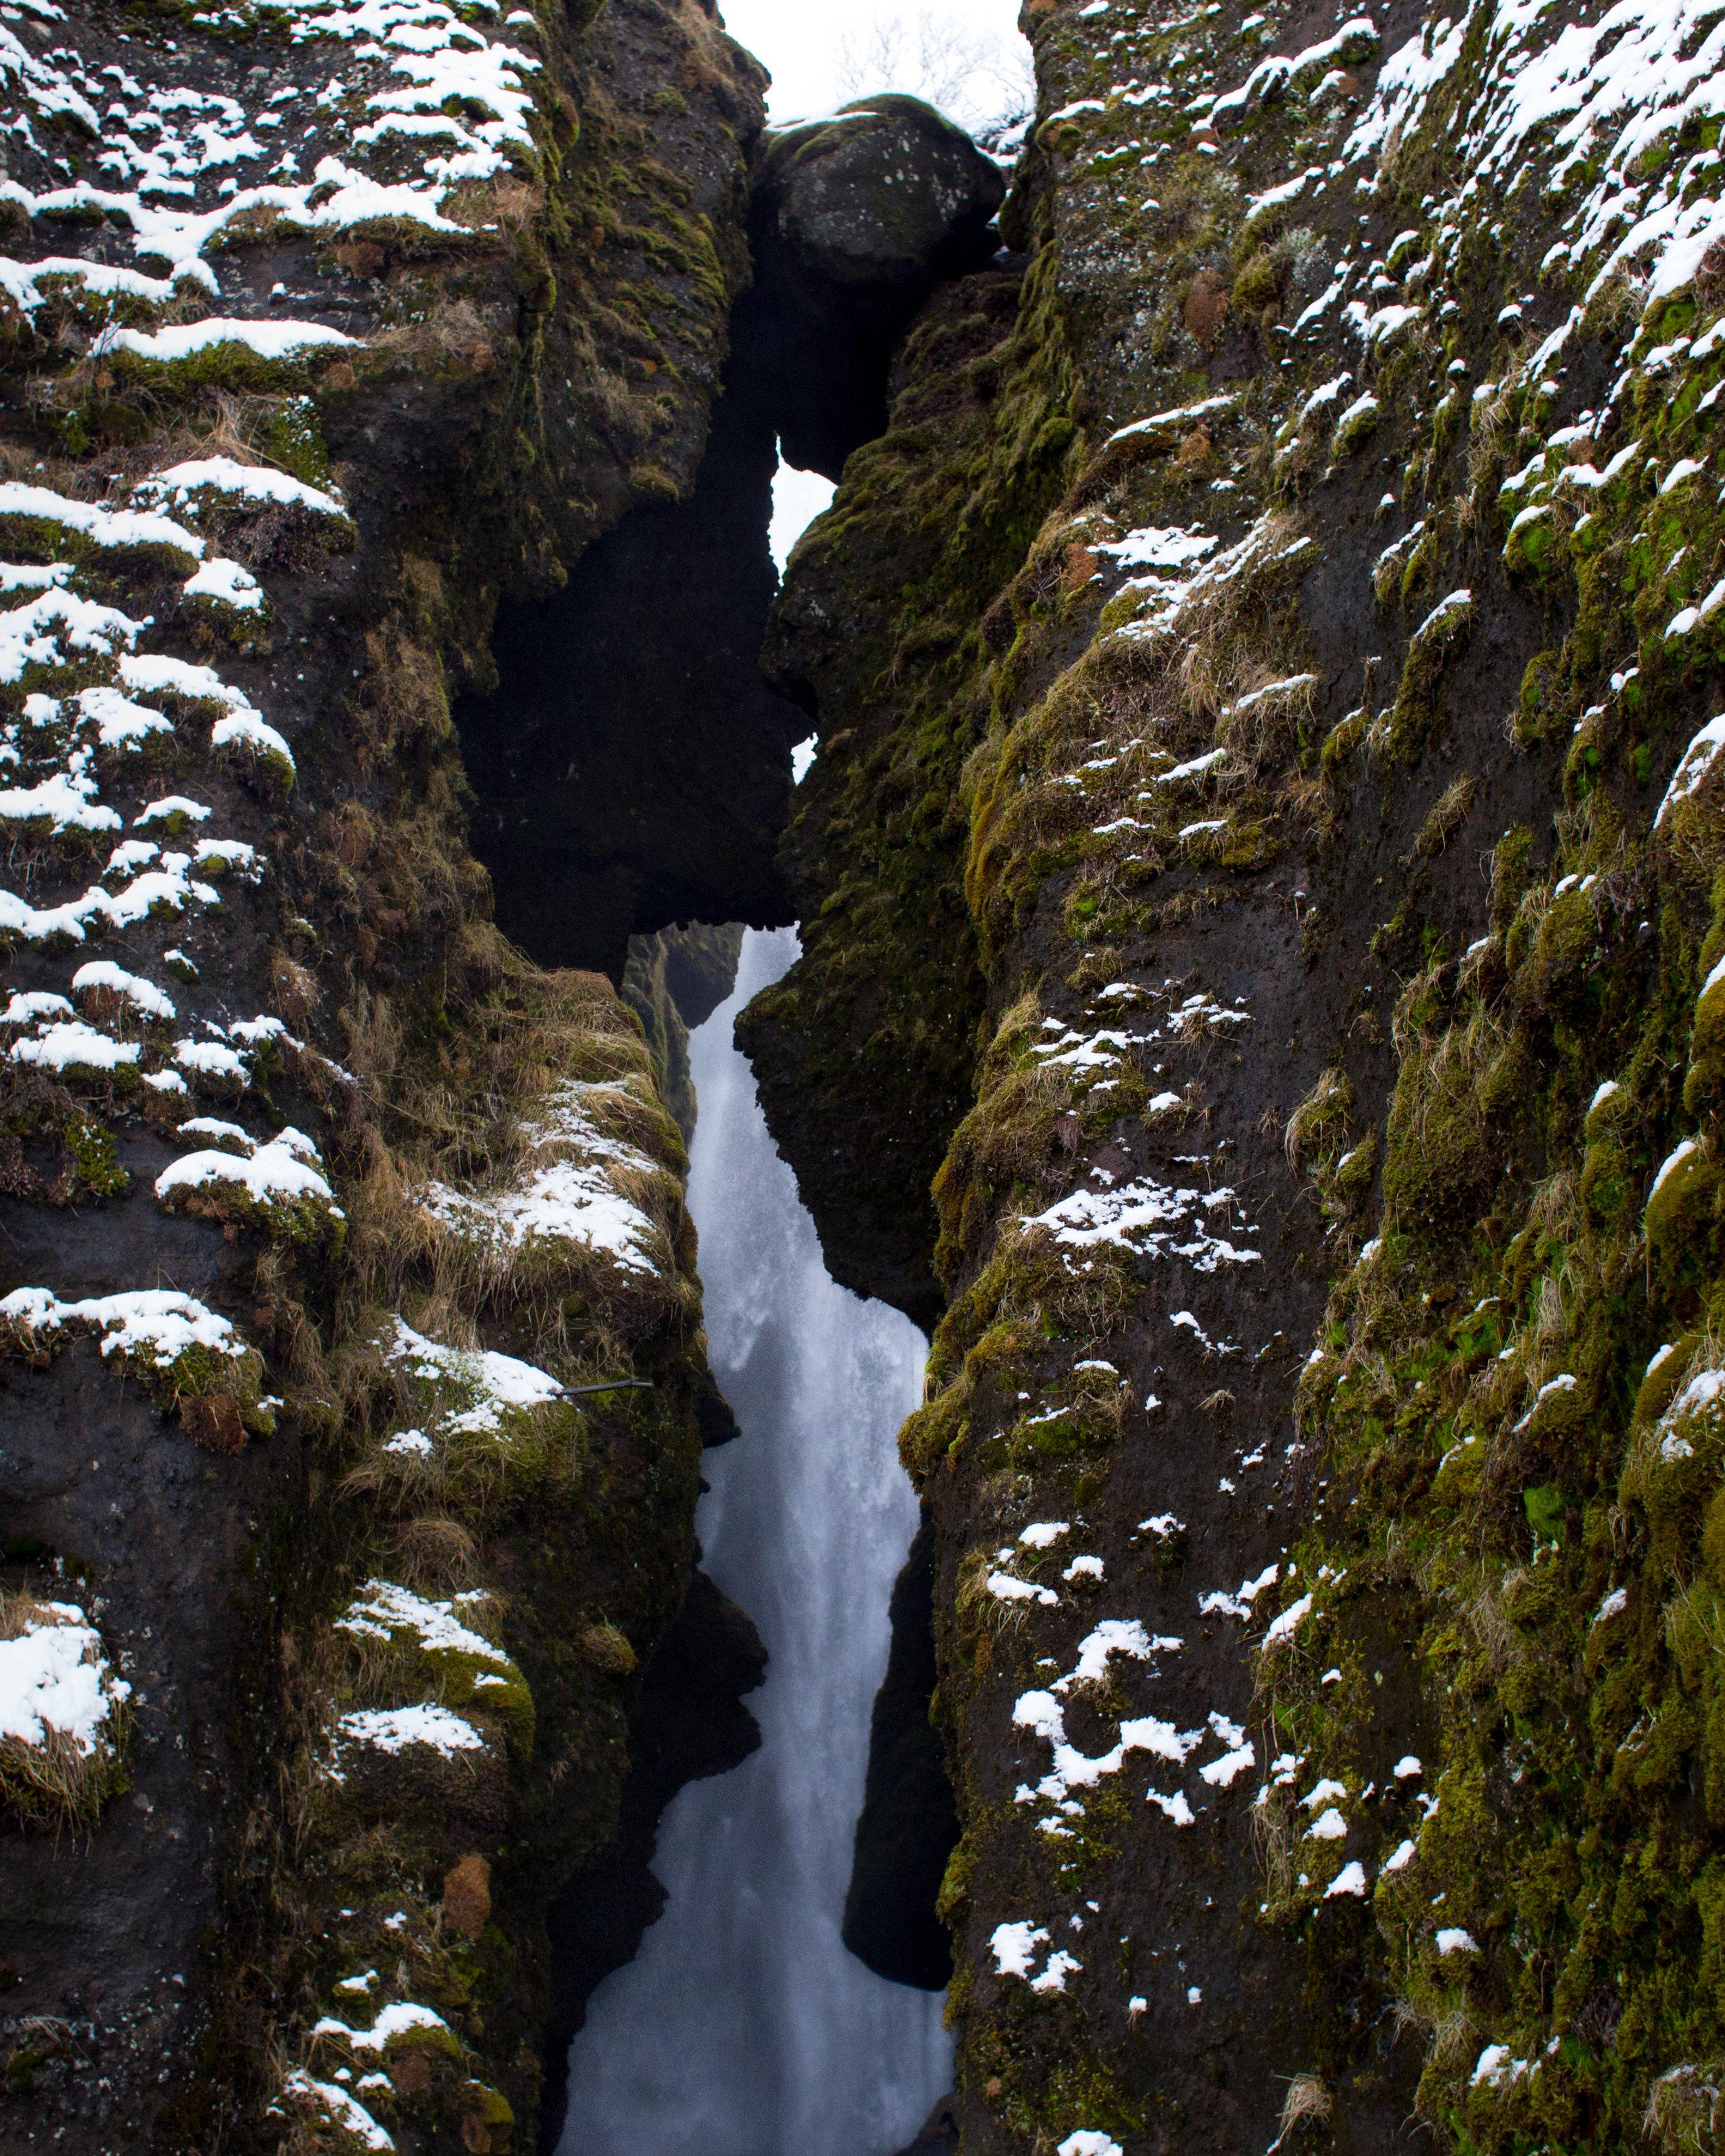 jermiah-schuster-iceland-333.jpg